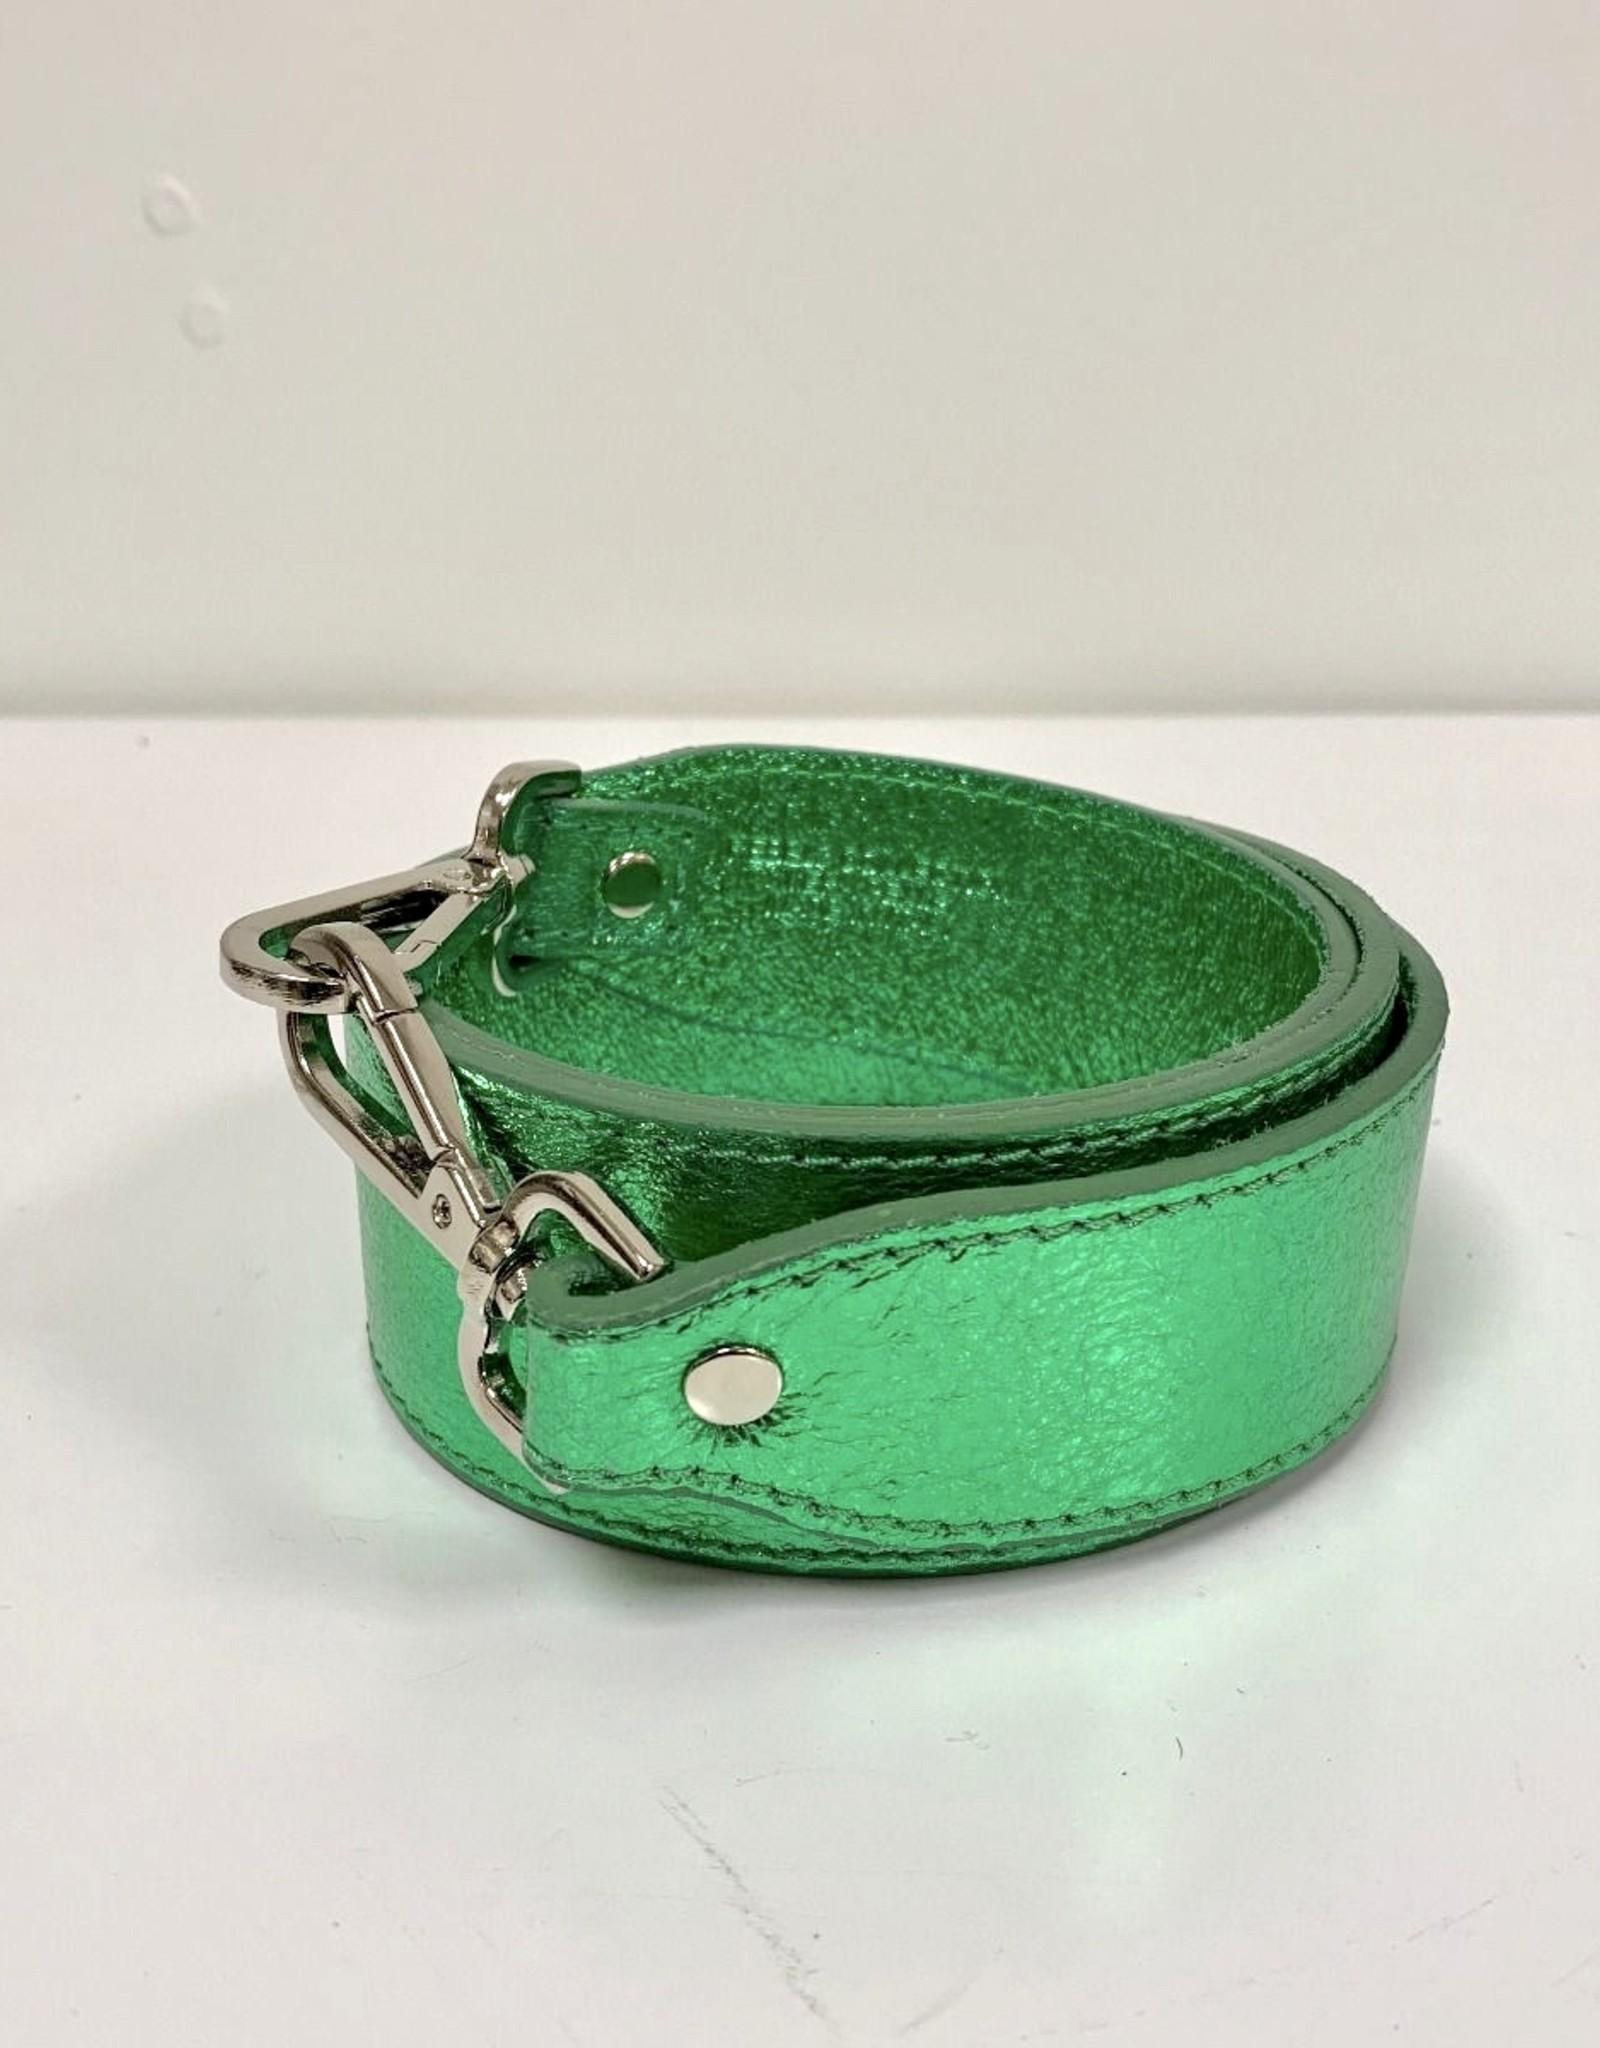 Rebelz Bag Strap Metallic Green